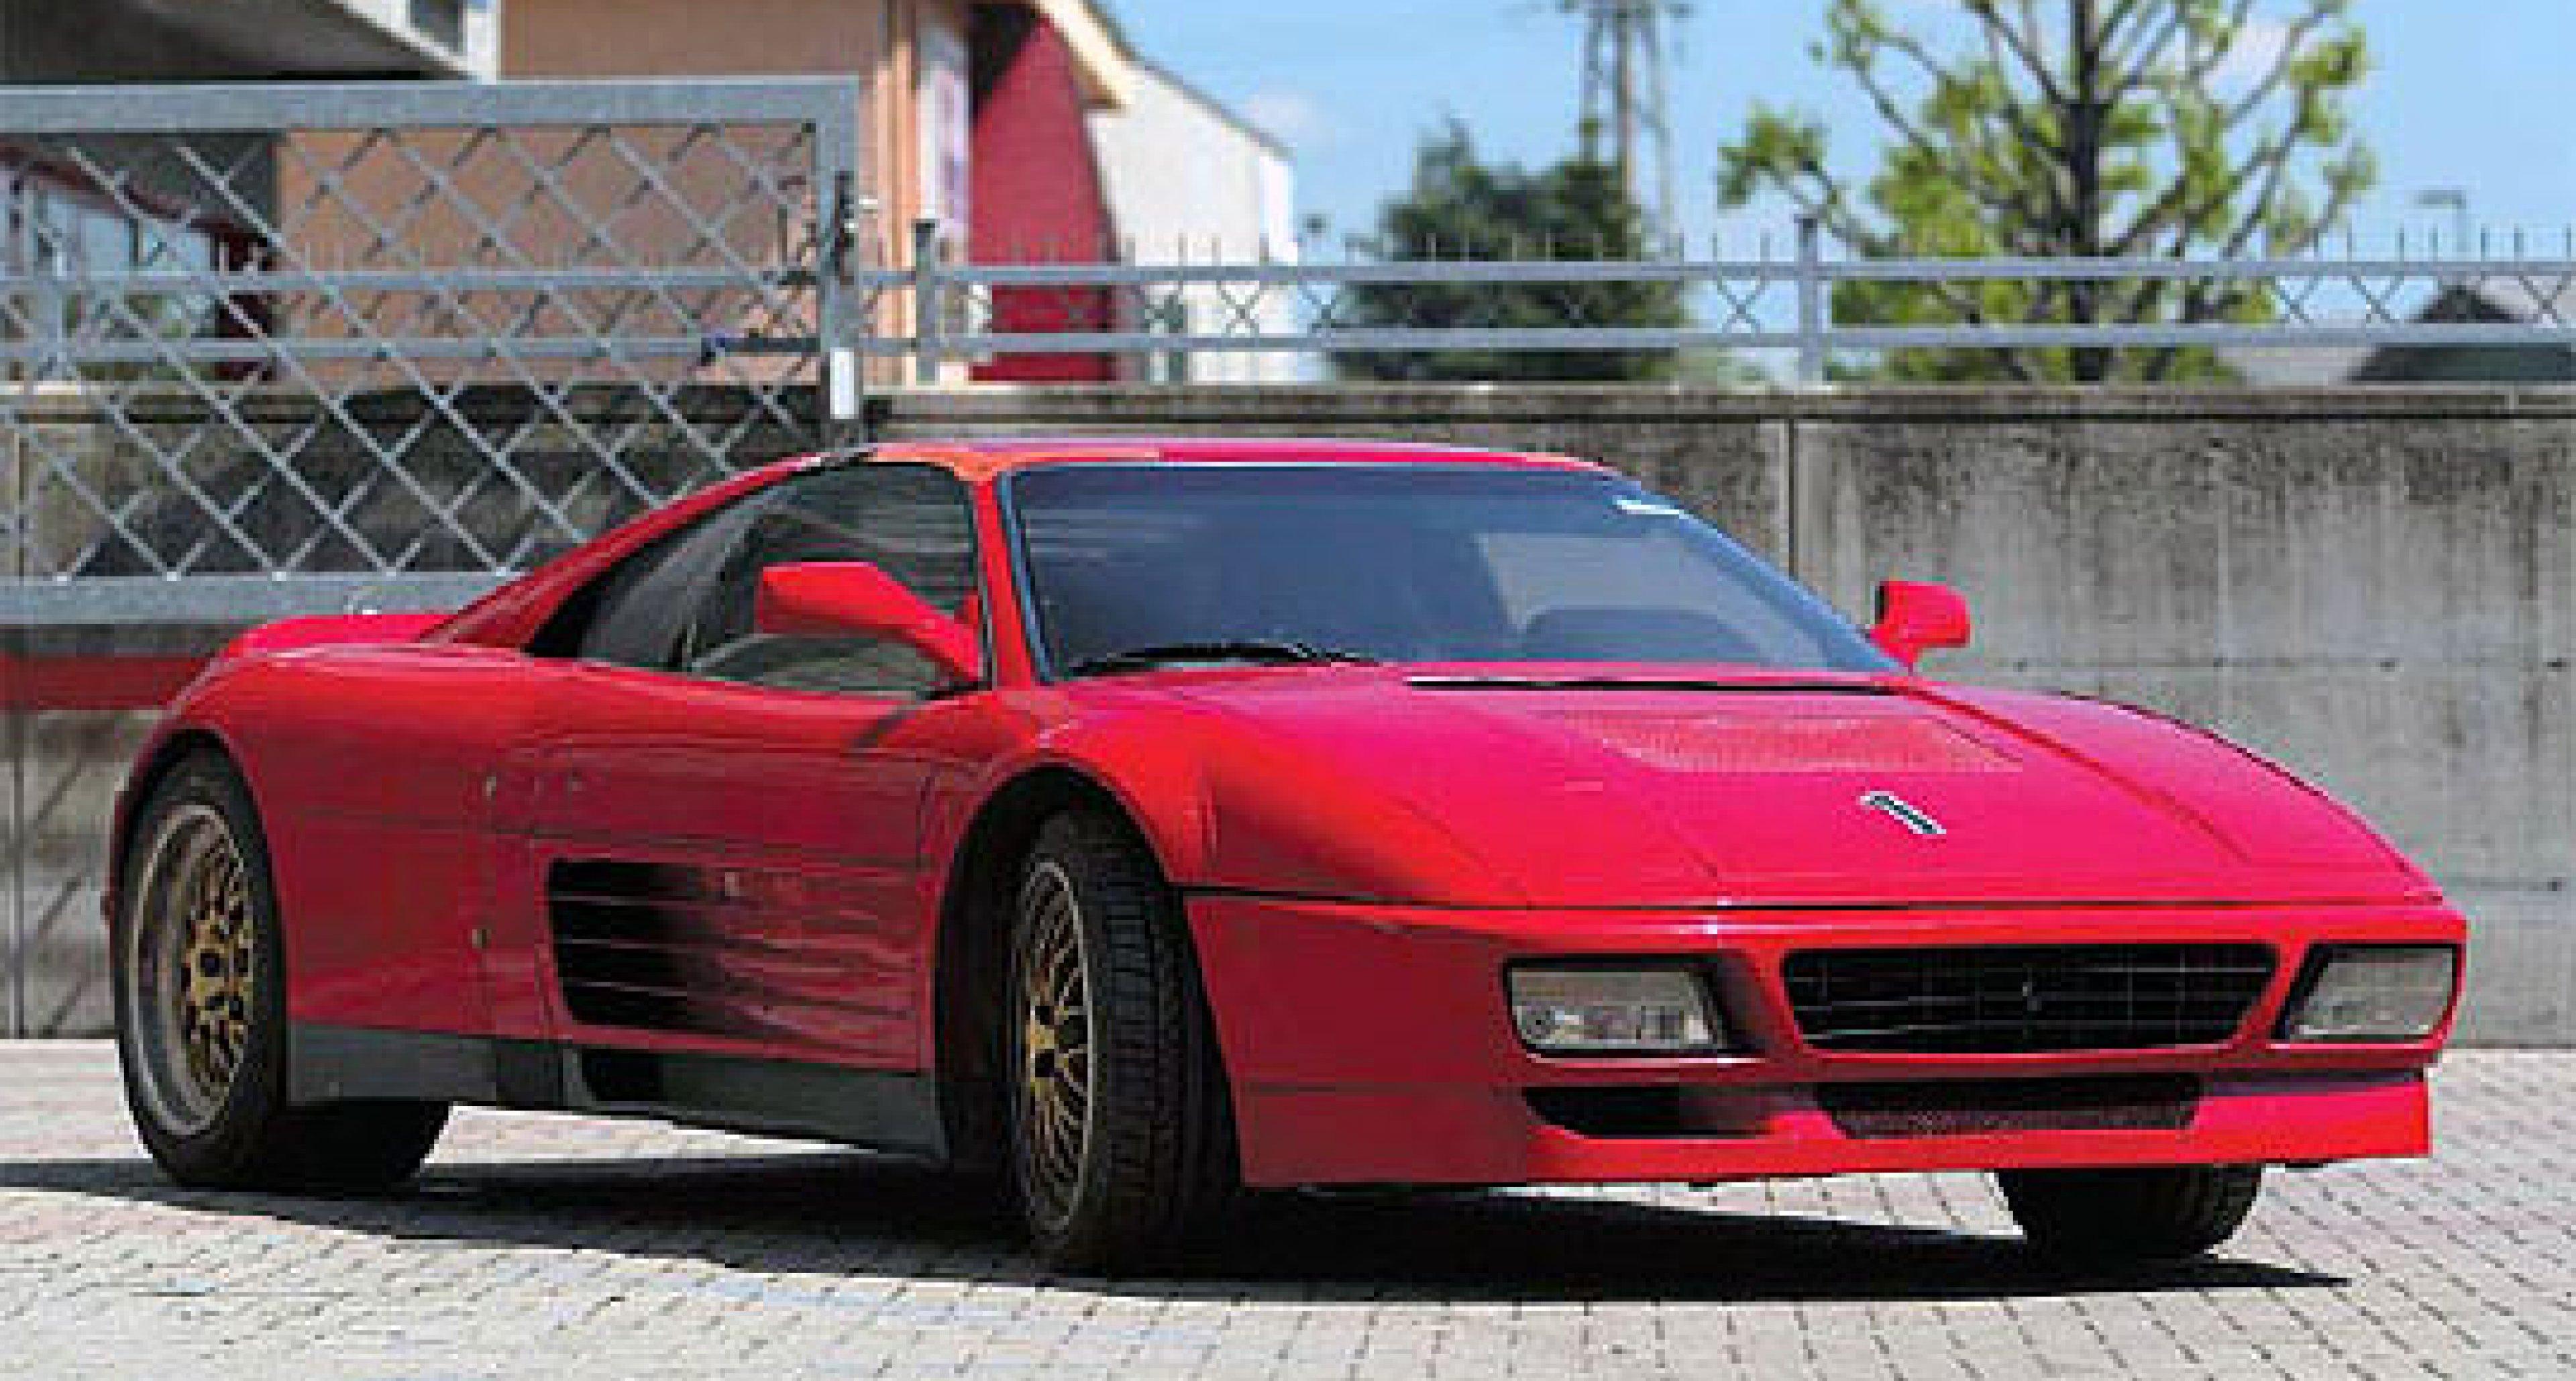 Sotheby's Ferrari und Maserati Auktion 2005 - Rückblick